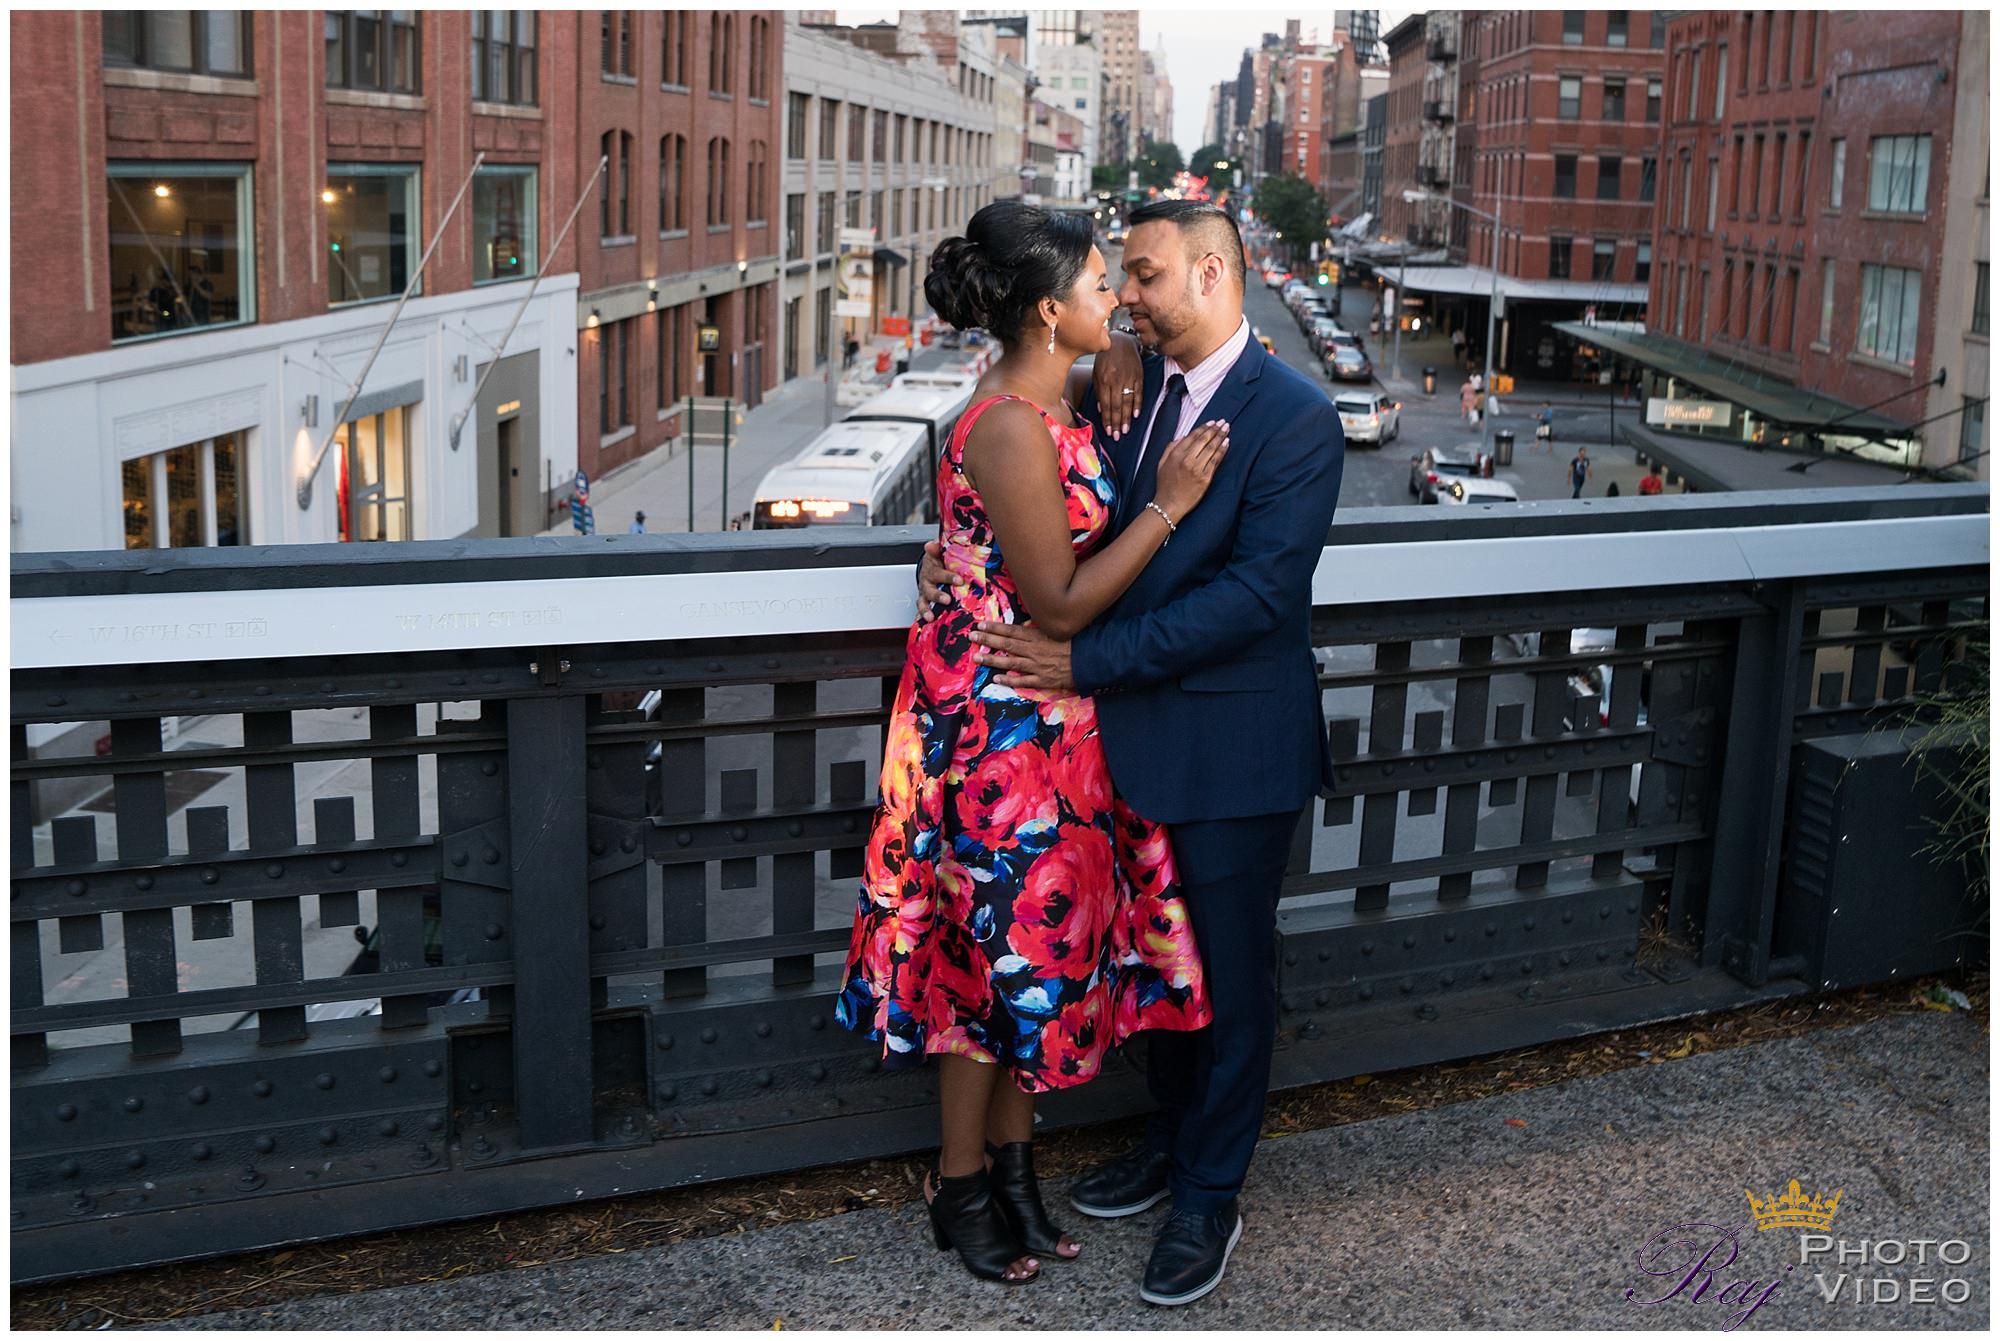 Highline-Bridge-NYC-Engagement-Shoot-Diana-Shaun-3.jpg